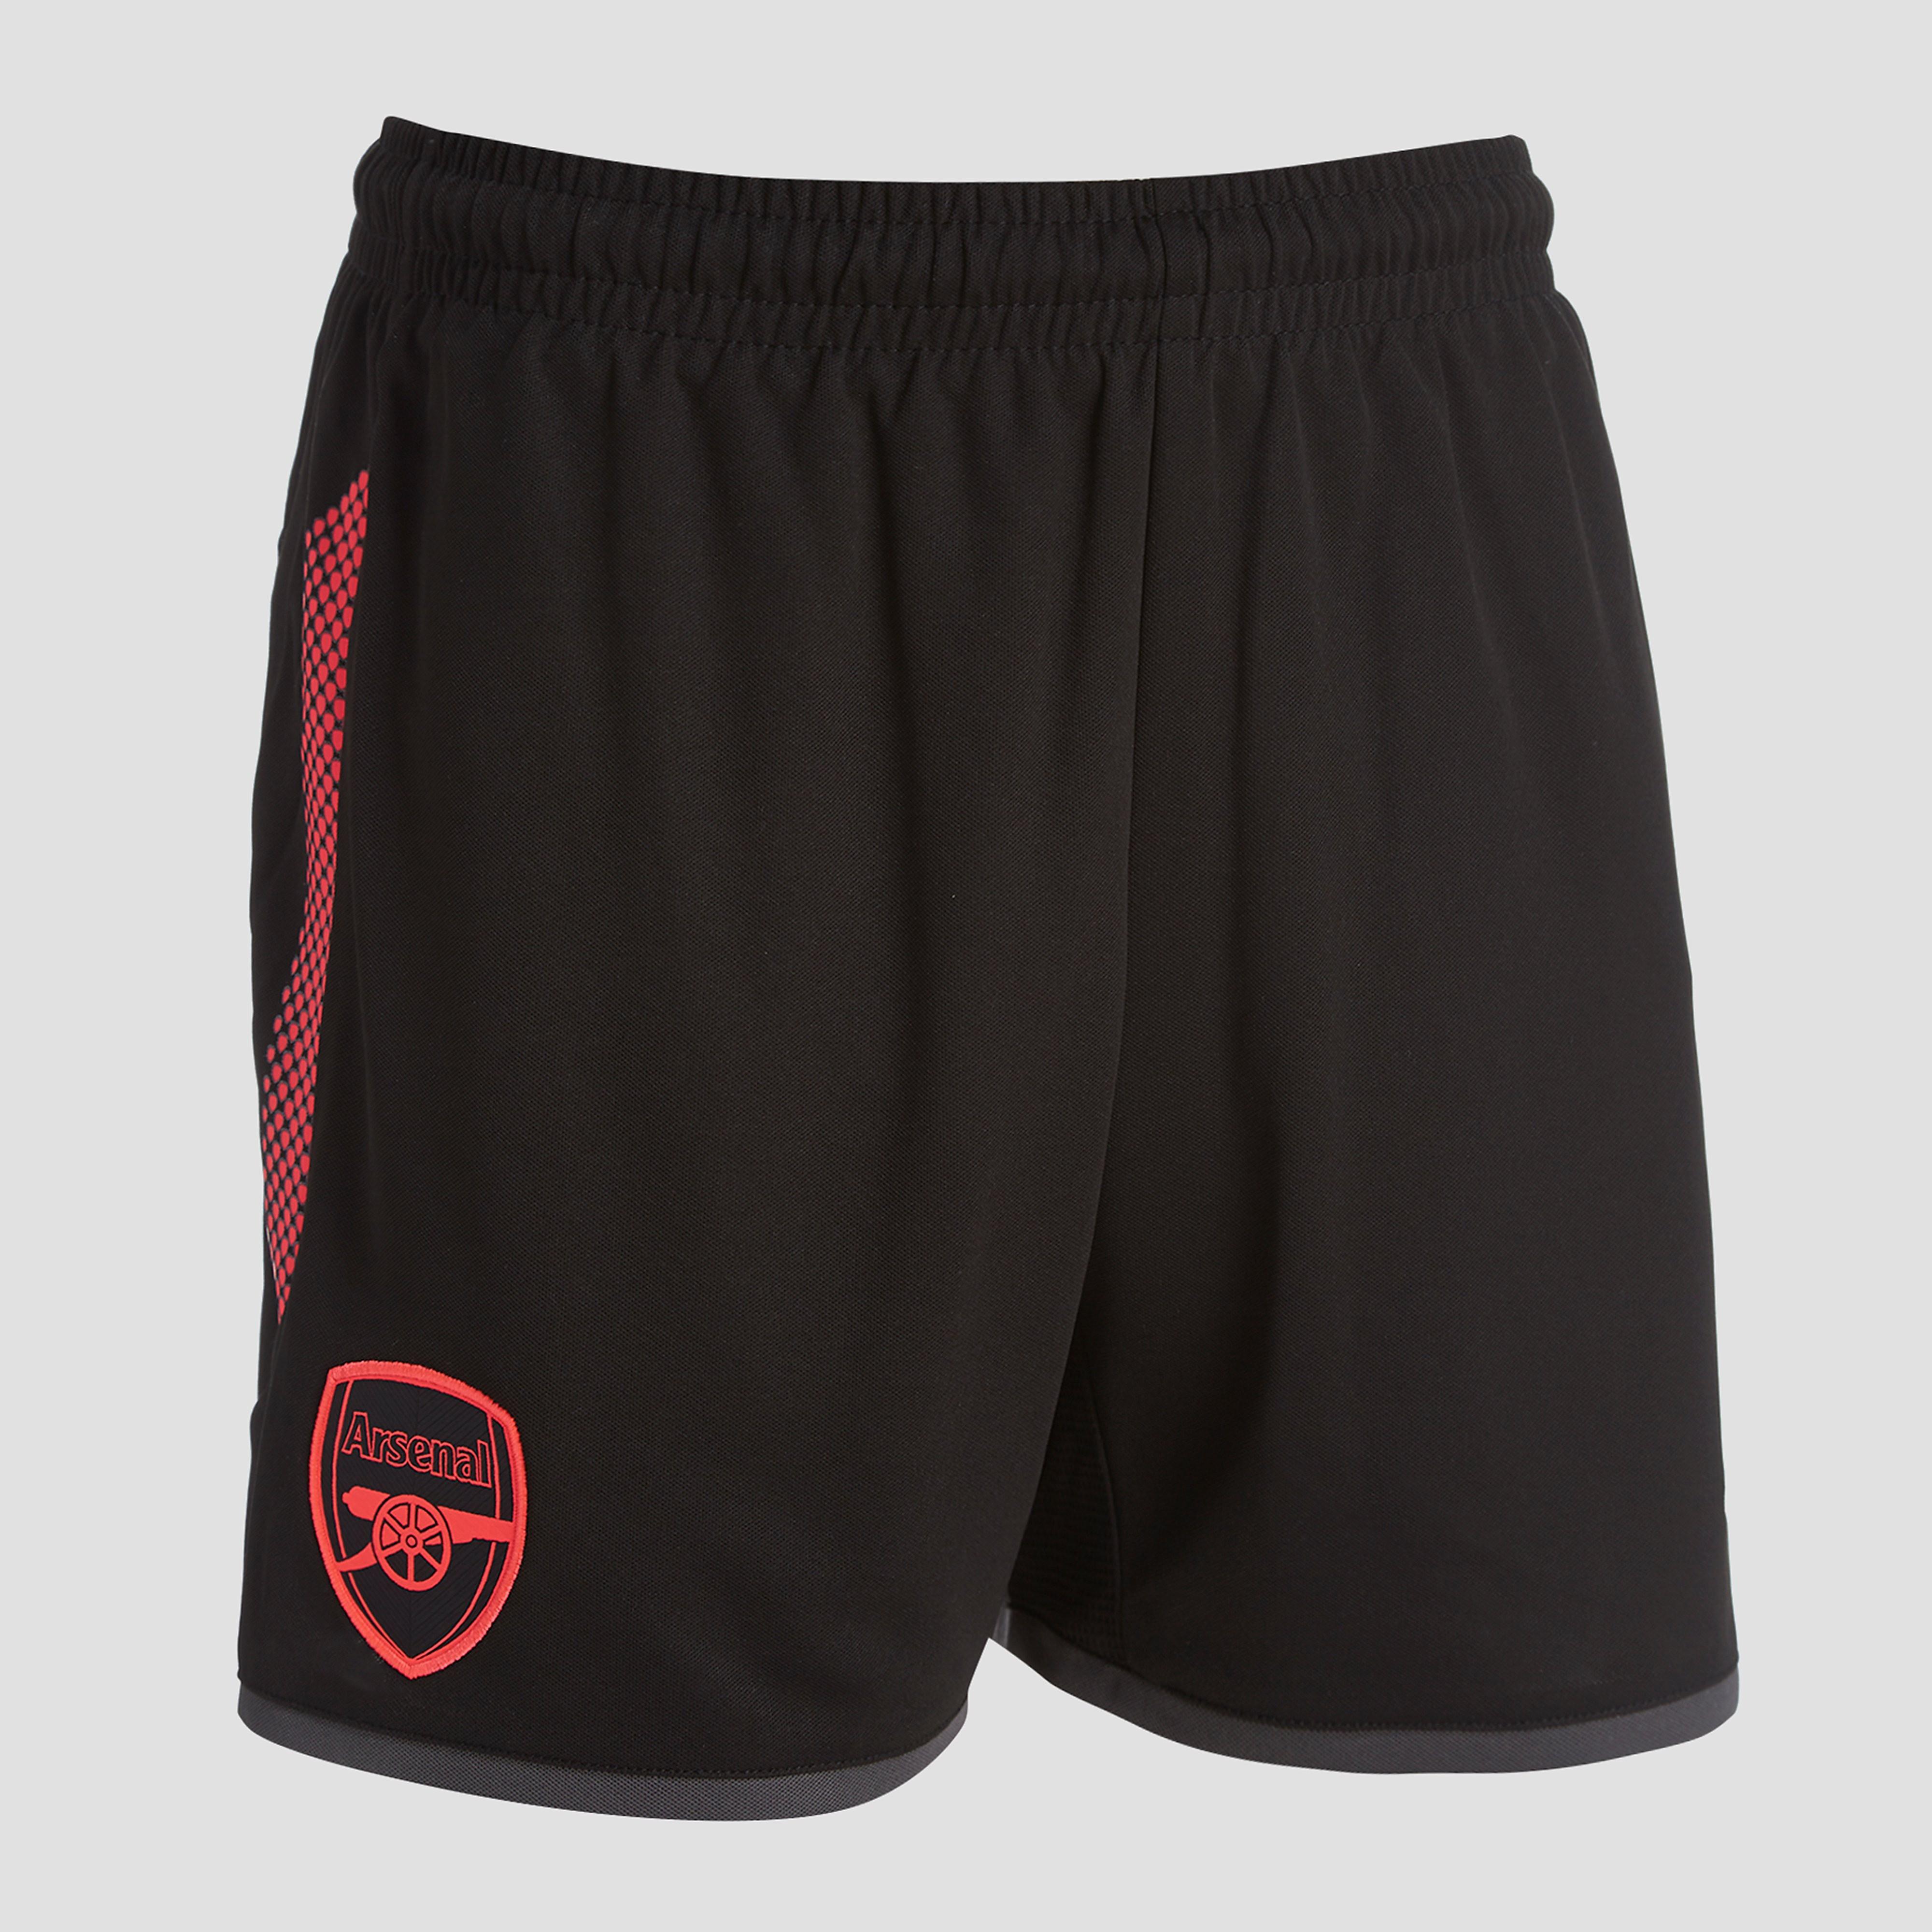 PUMA Arsenal FC 2017/18 Third Shorts Junior